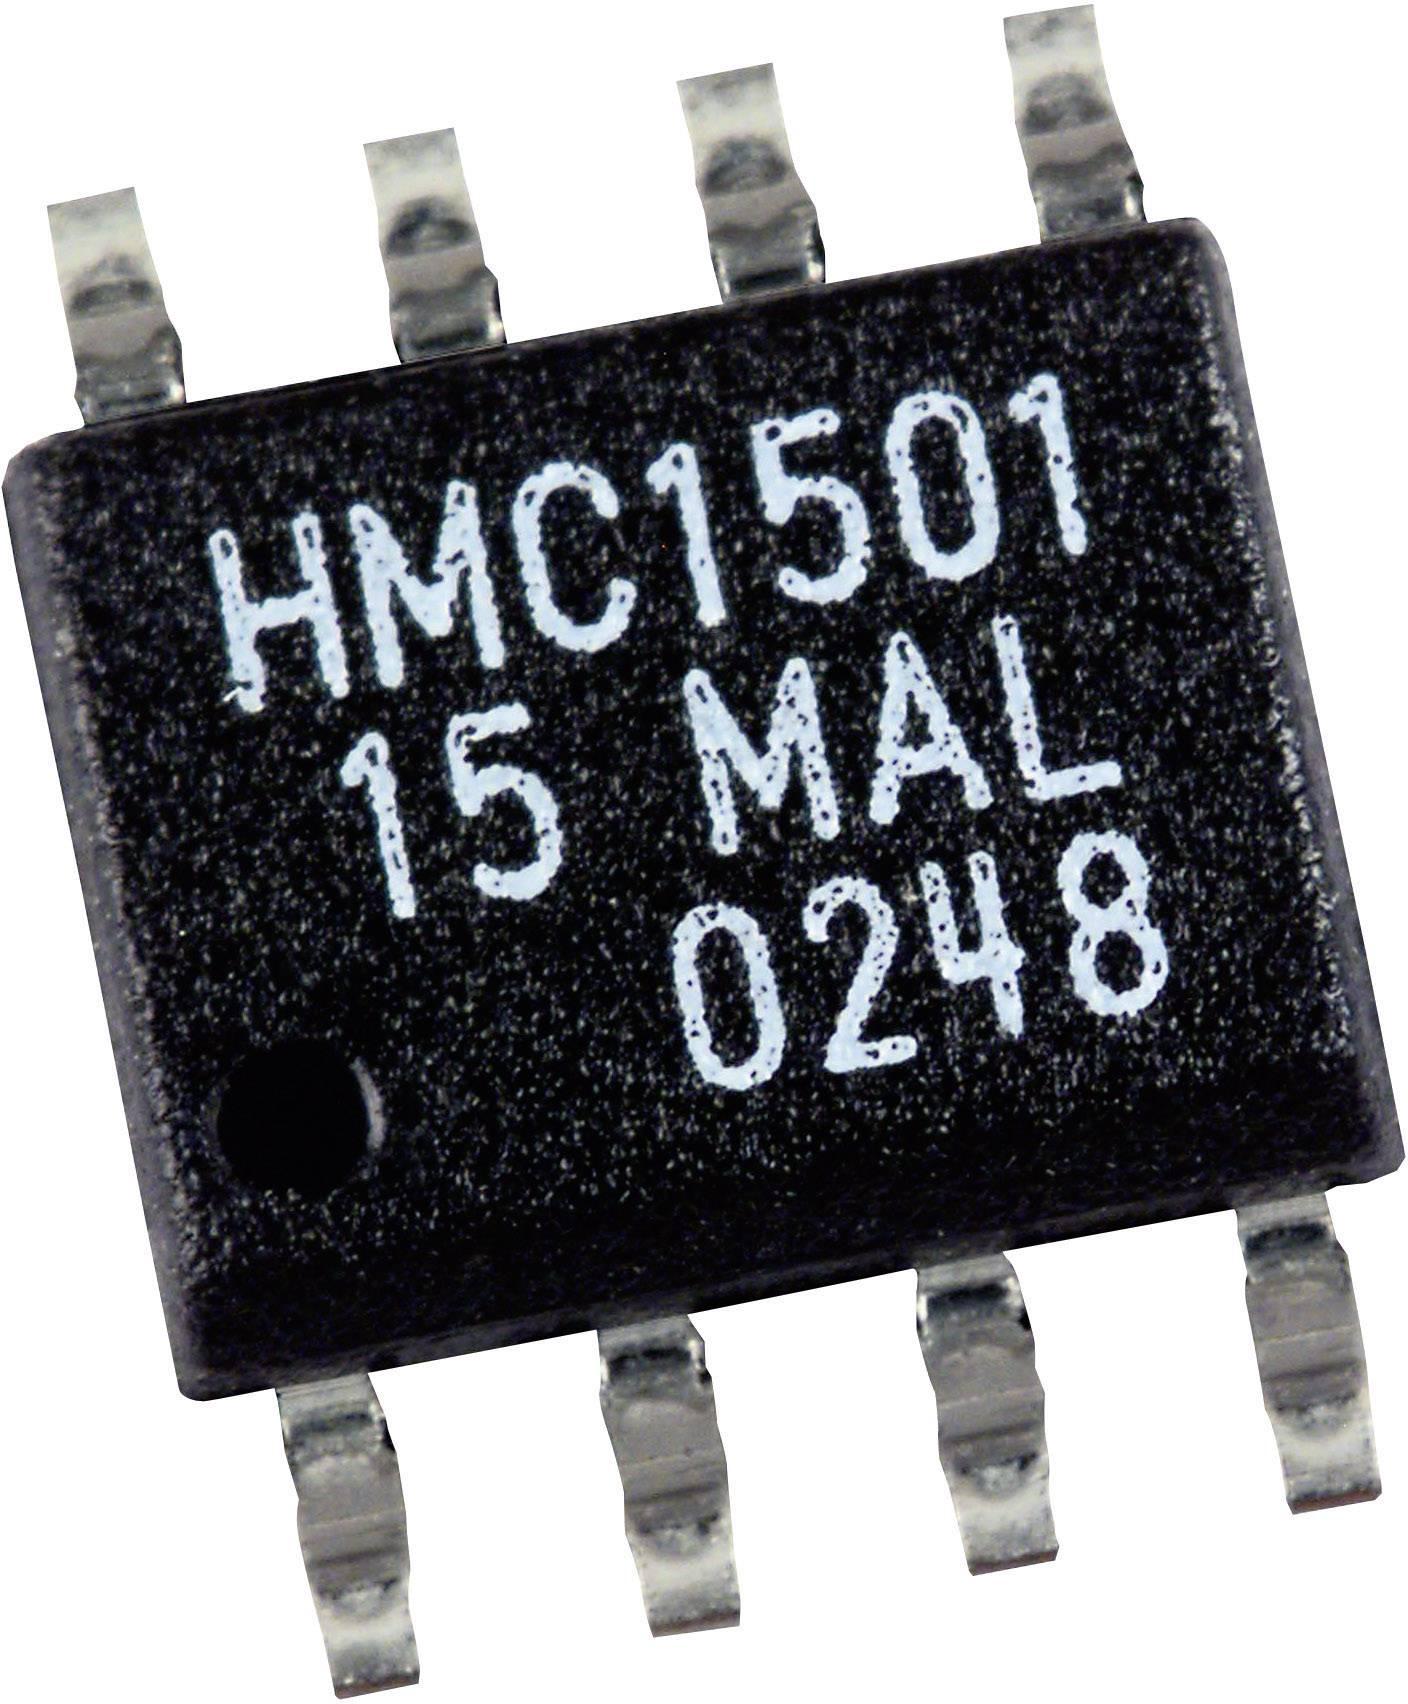 Magnetoresistivní senzor Honeywell HMC1501, 1 - 25 V, SOIC 8